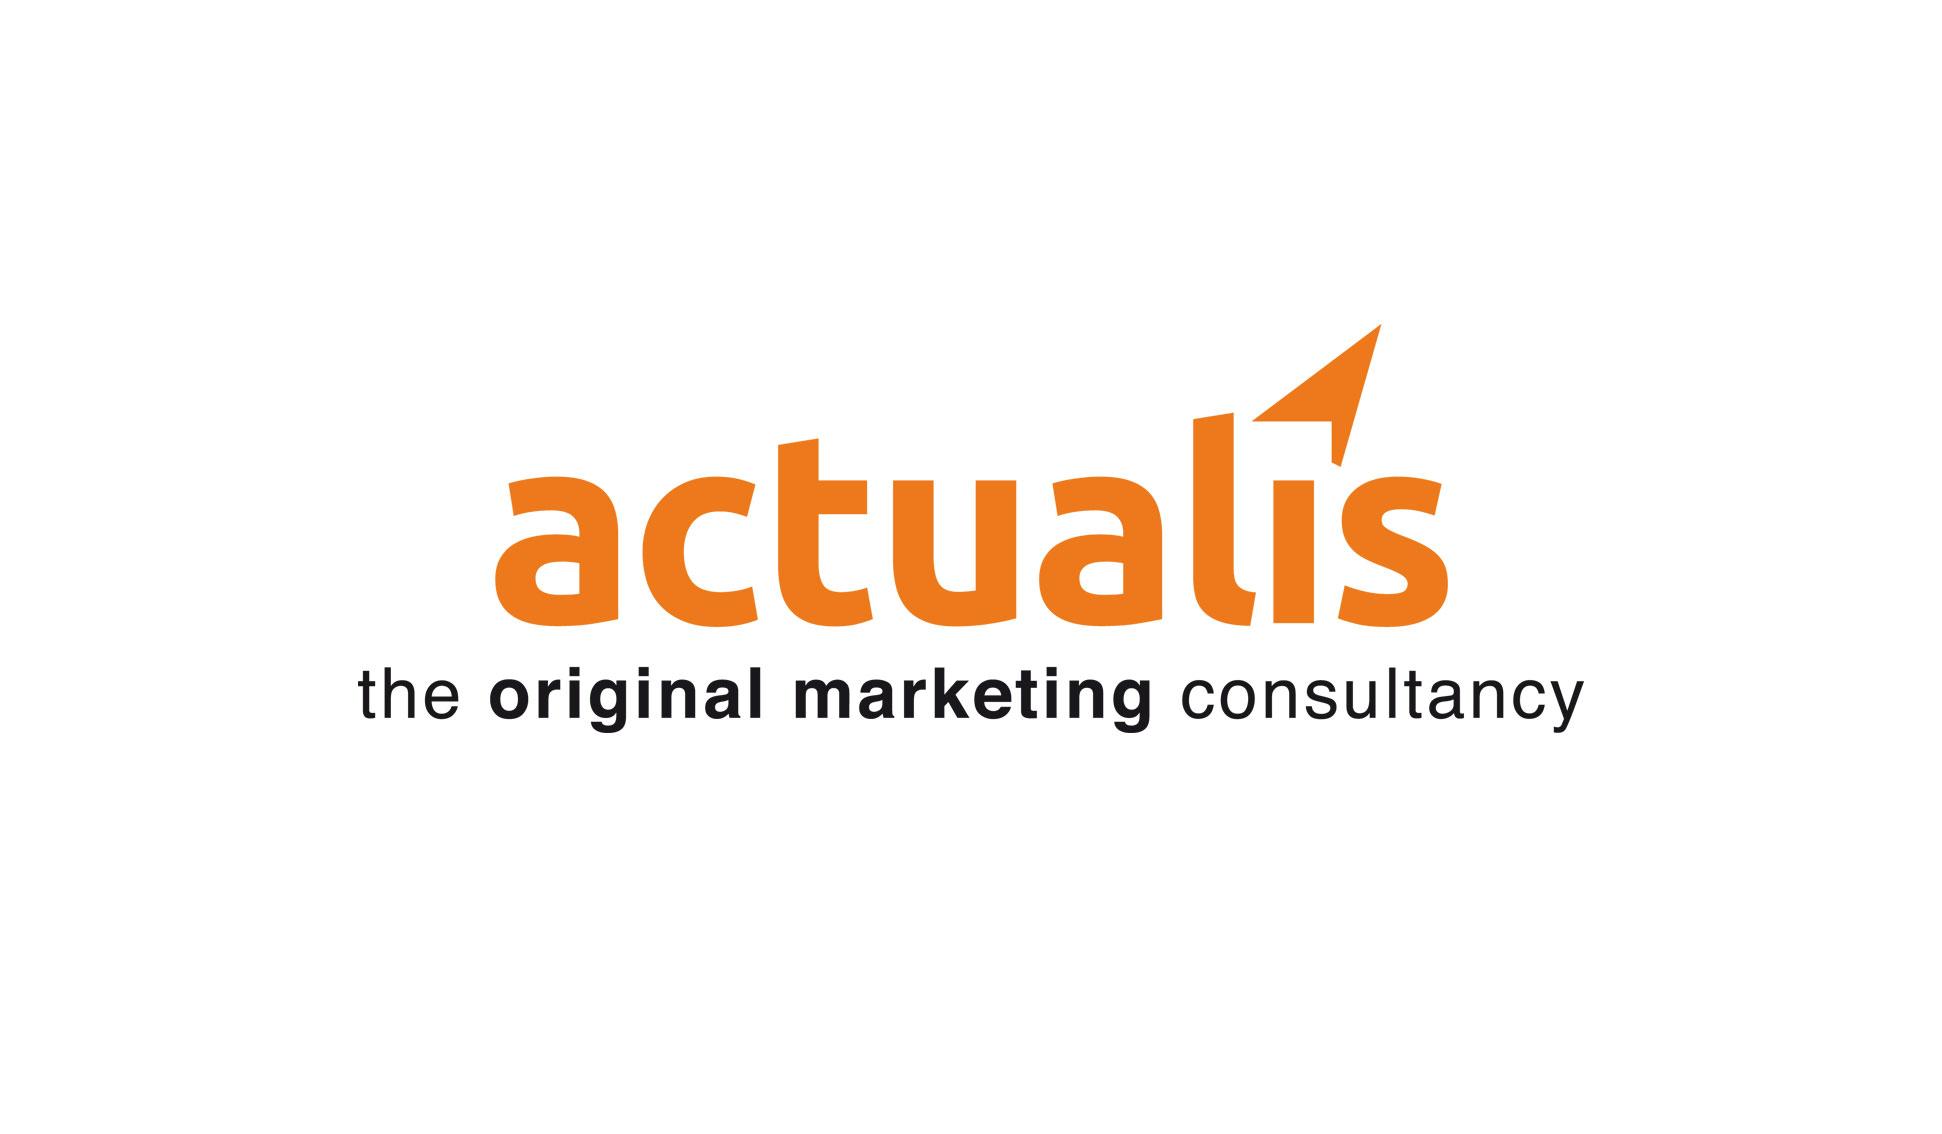 actualis_logo